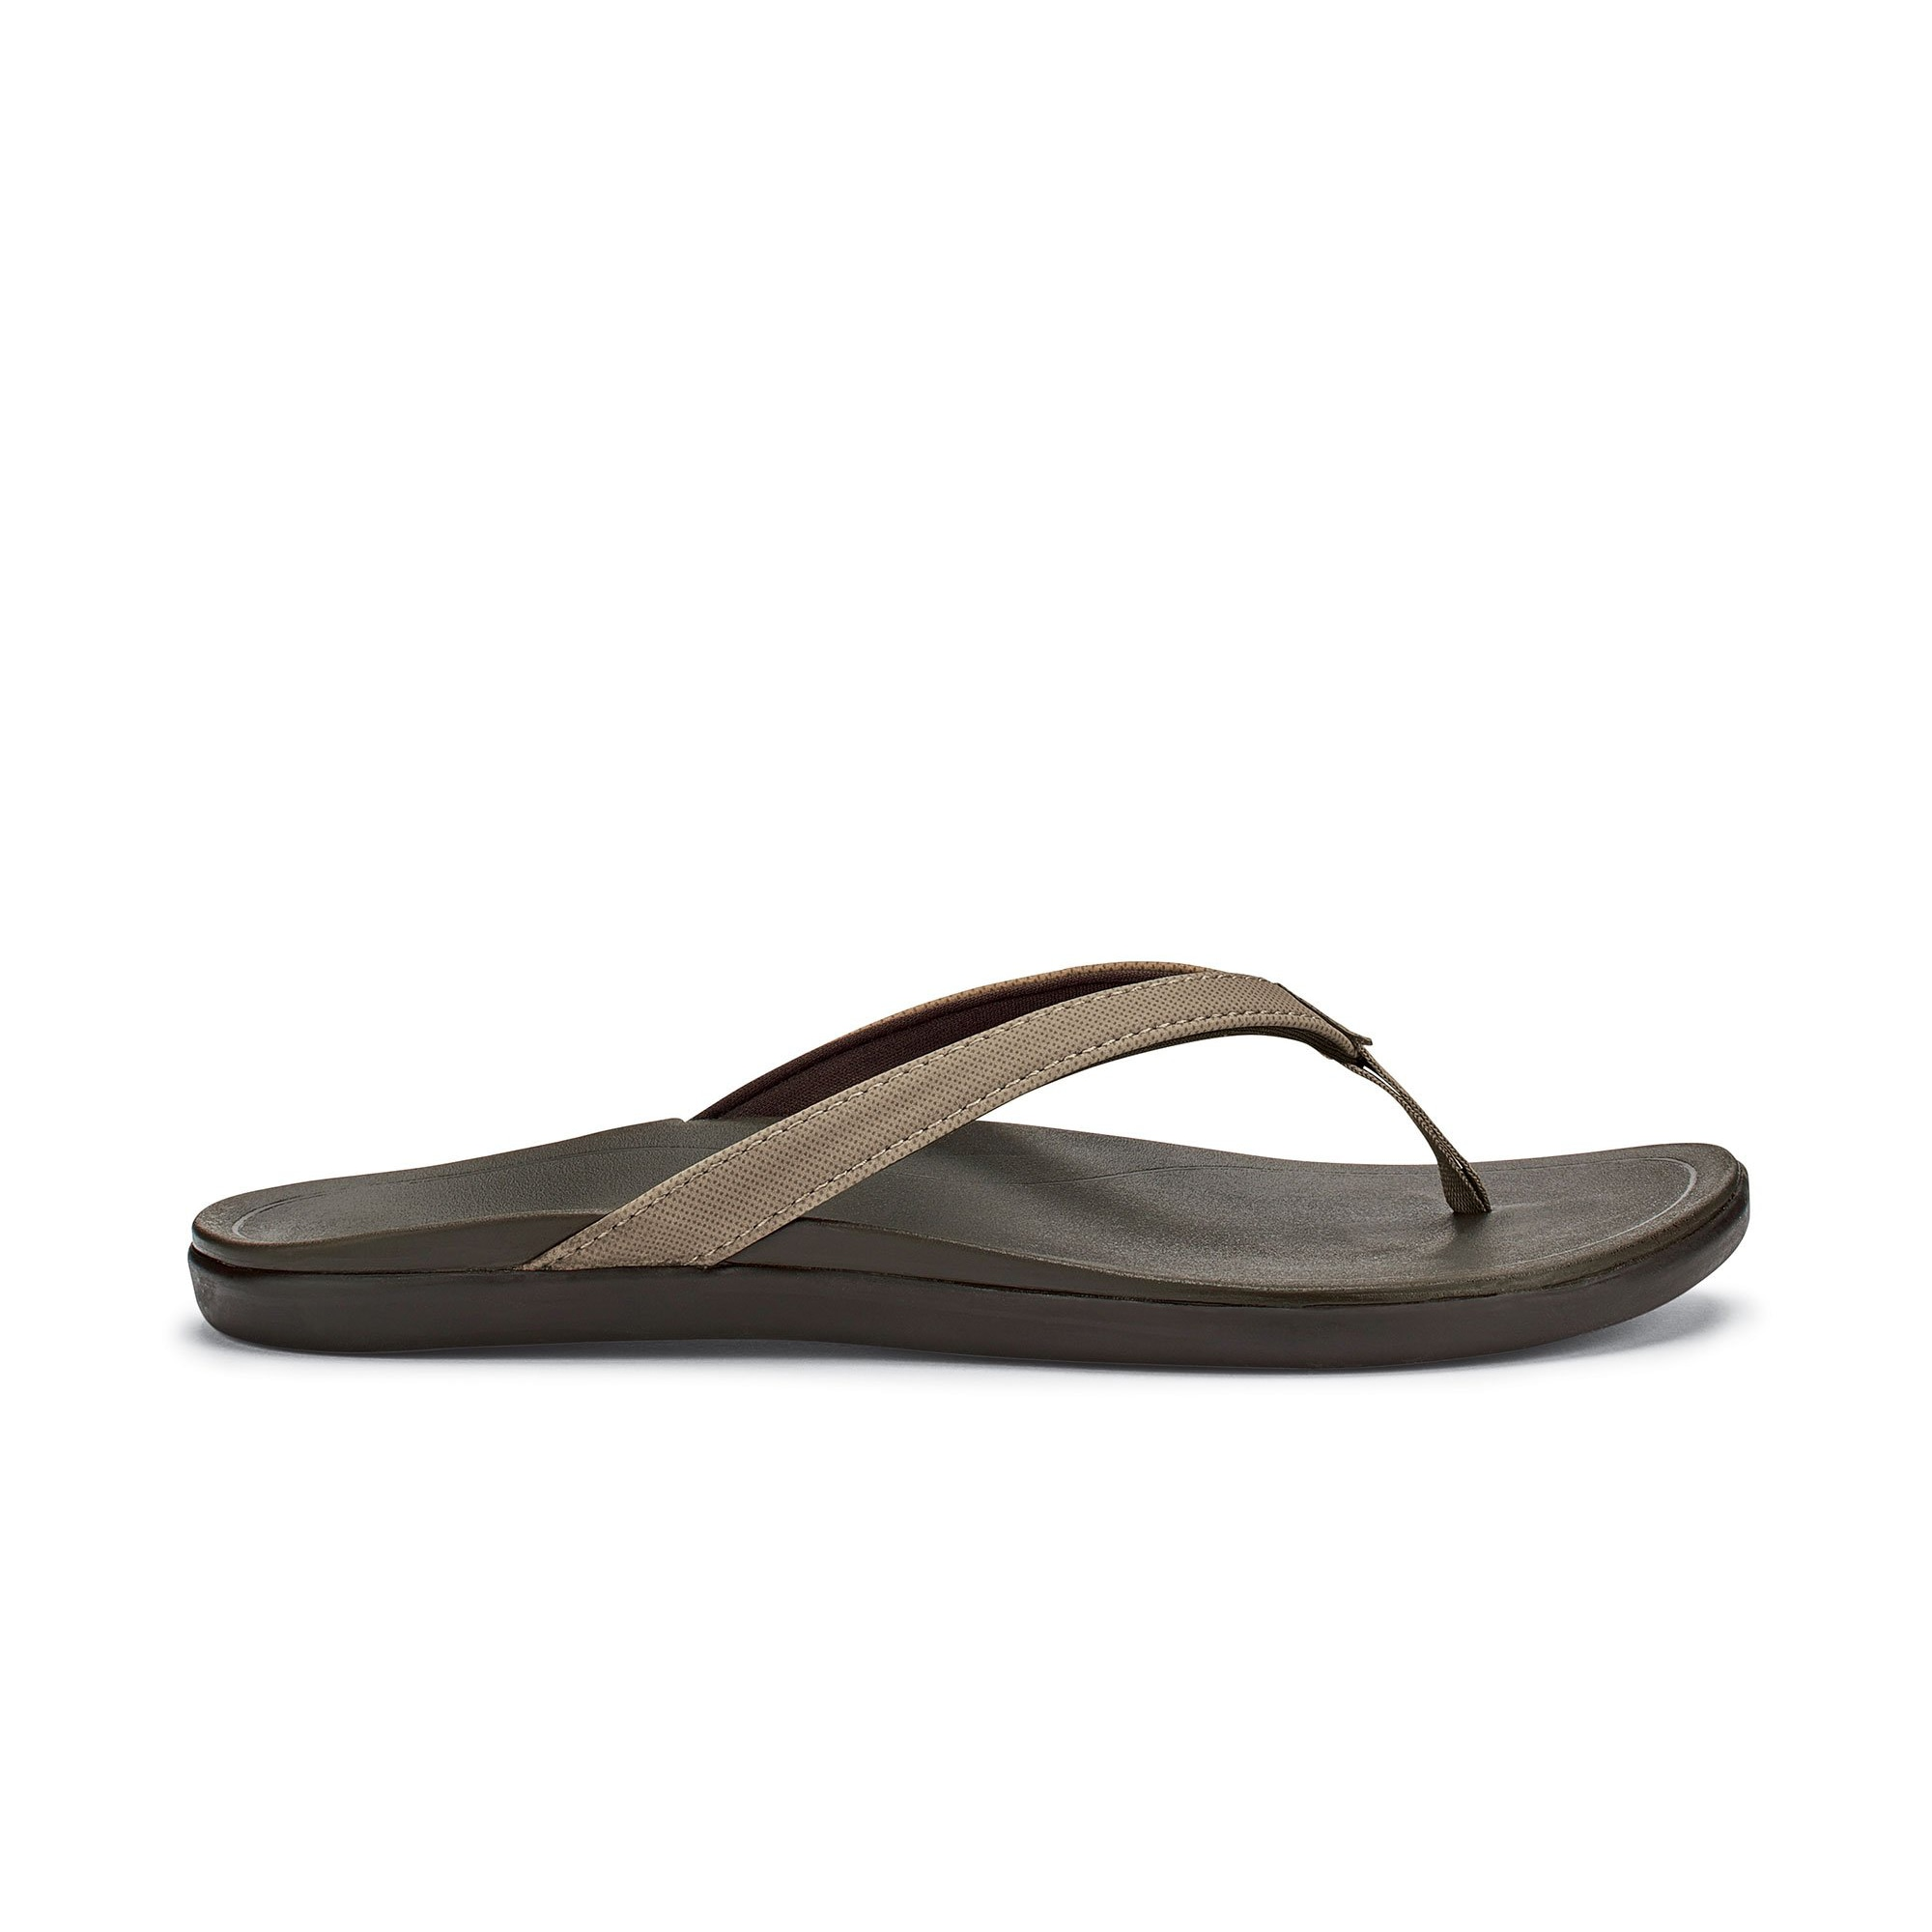 Ho'opio Sandal - Women's